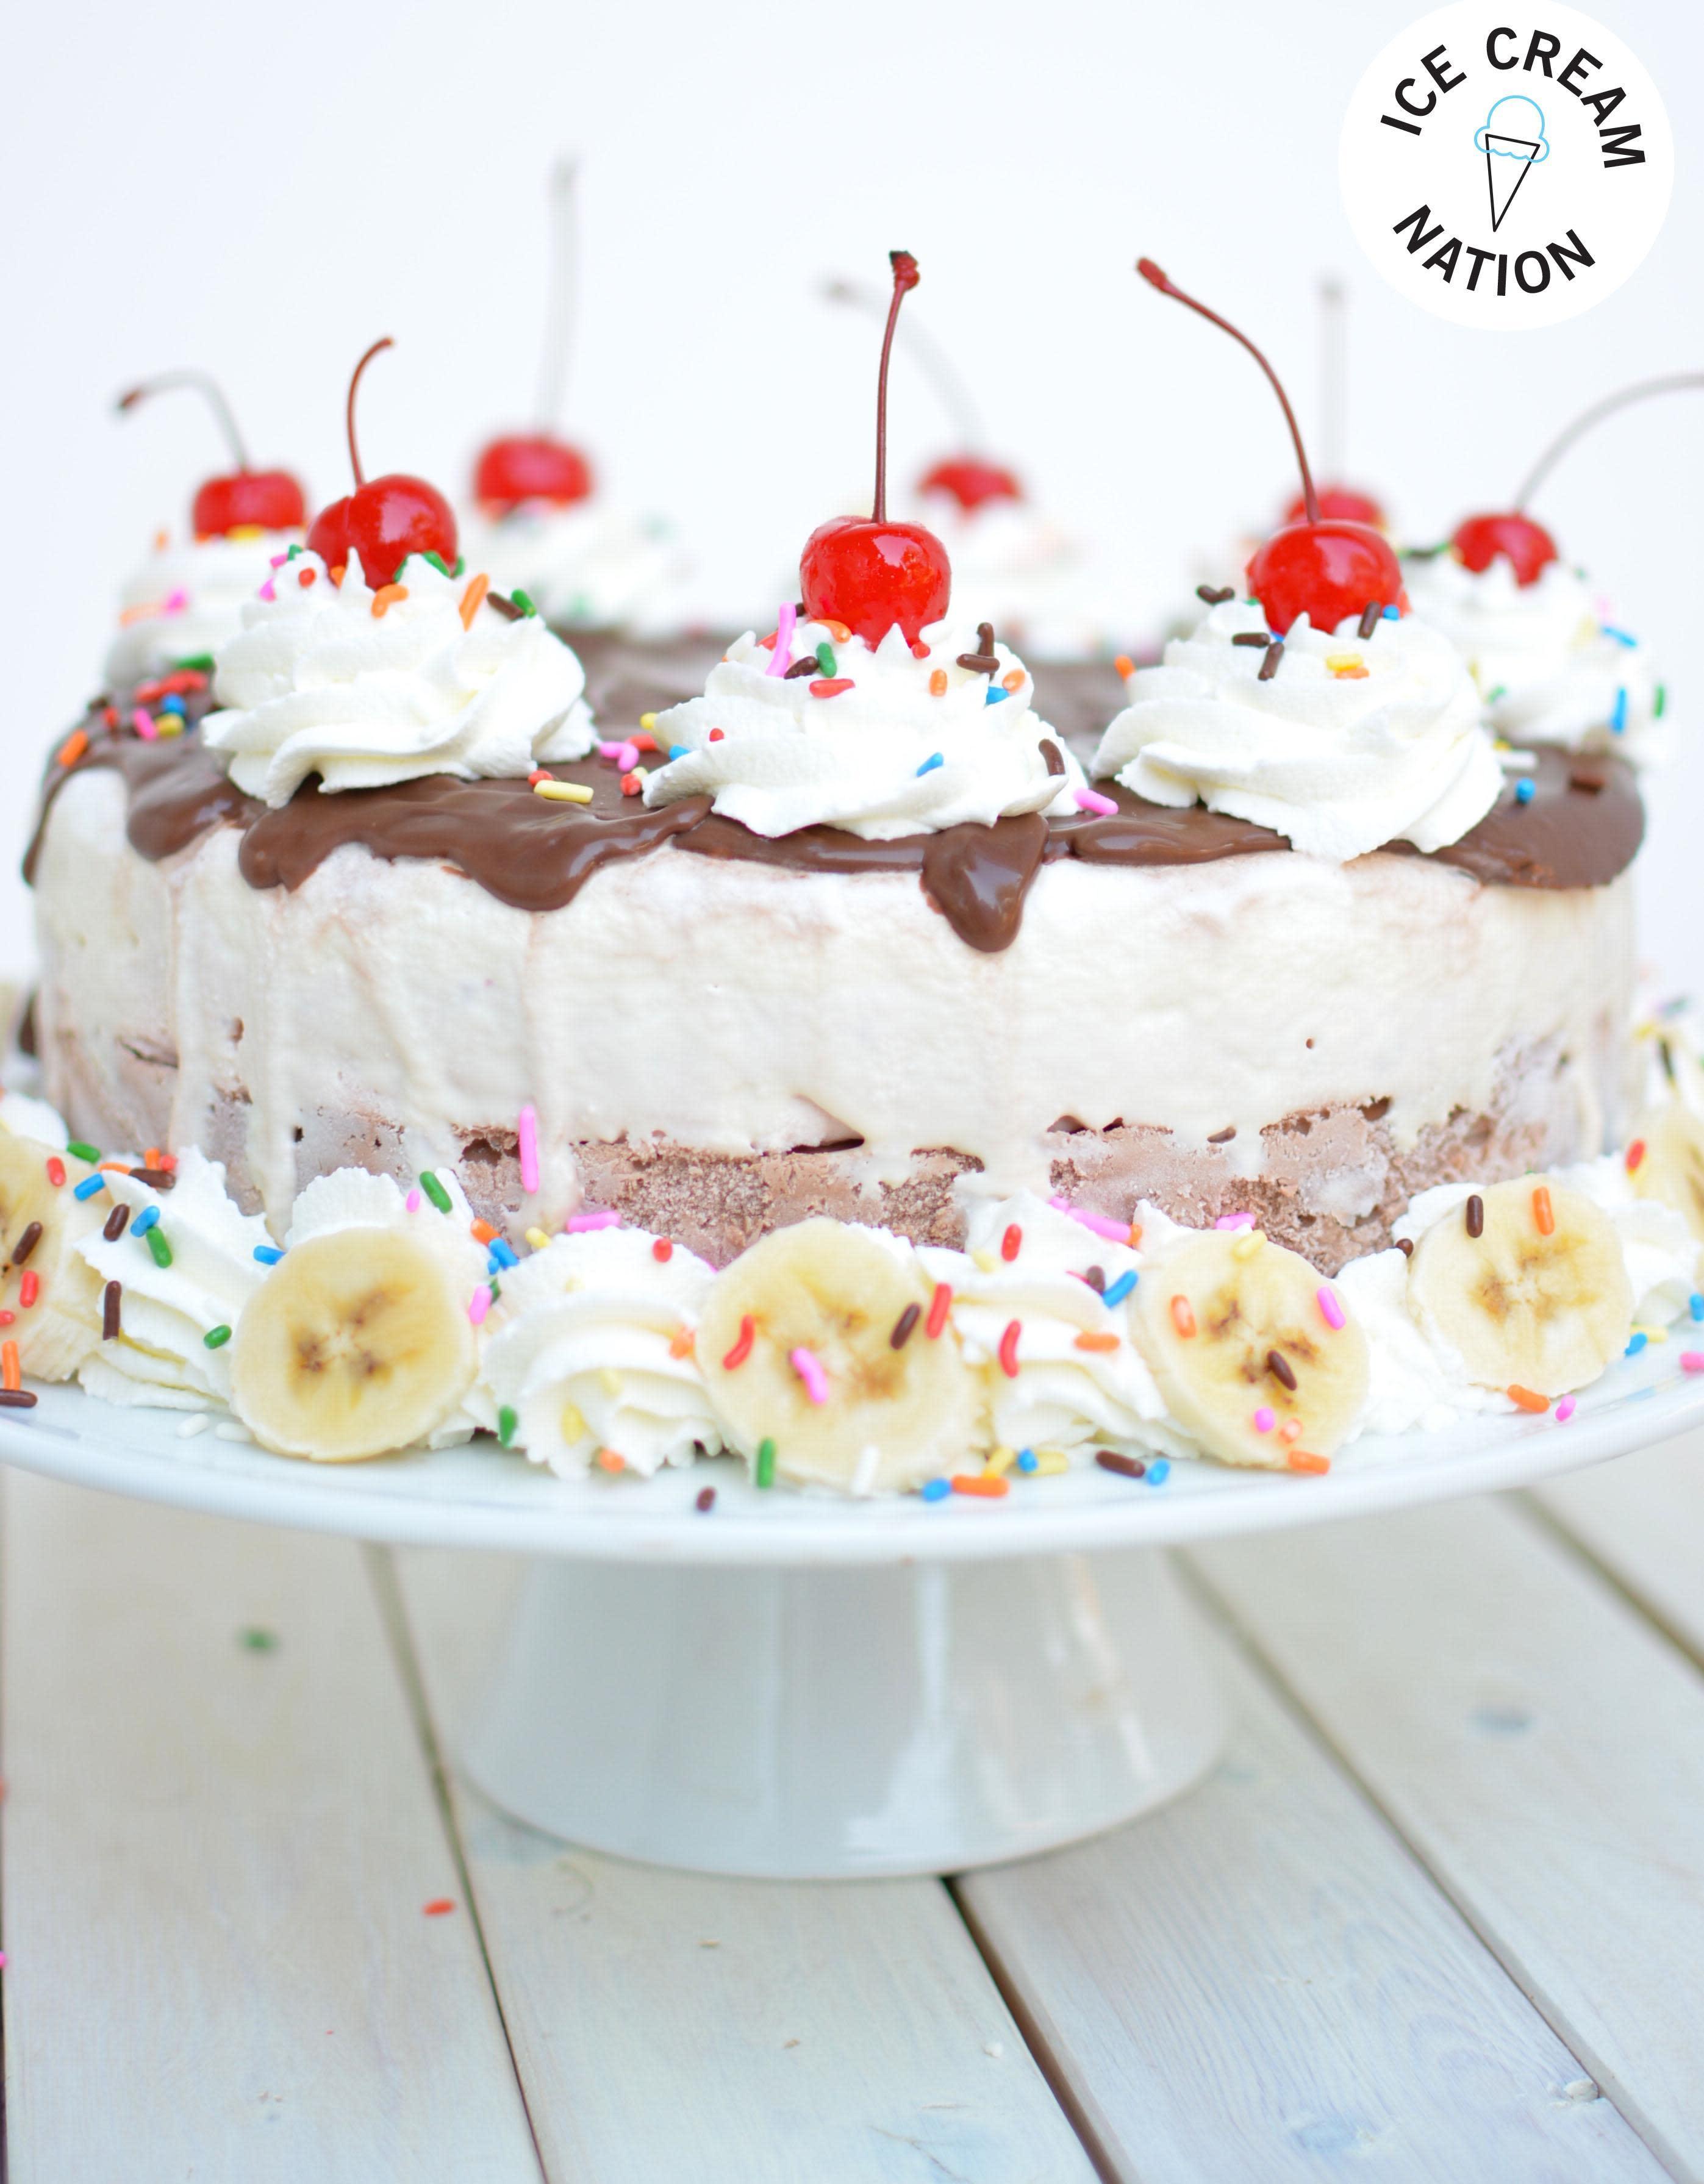 Ice Cream Cake Merced